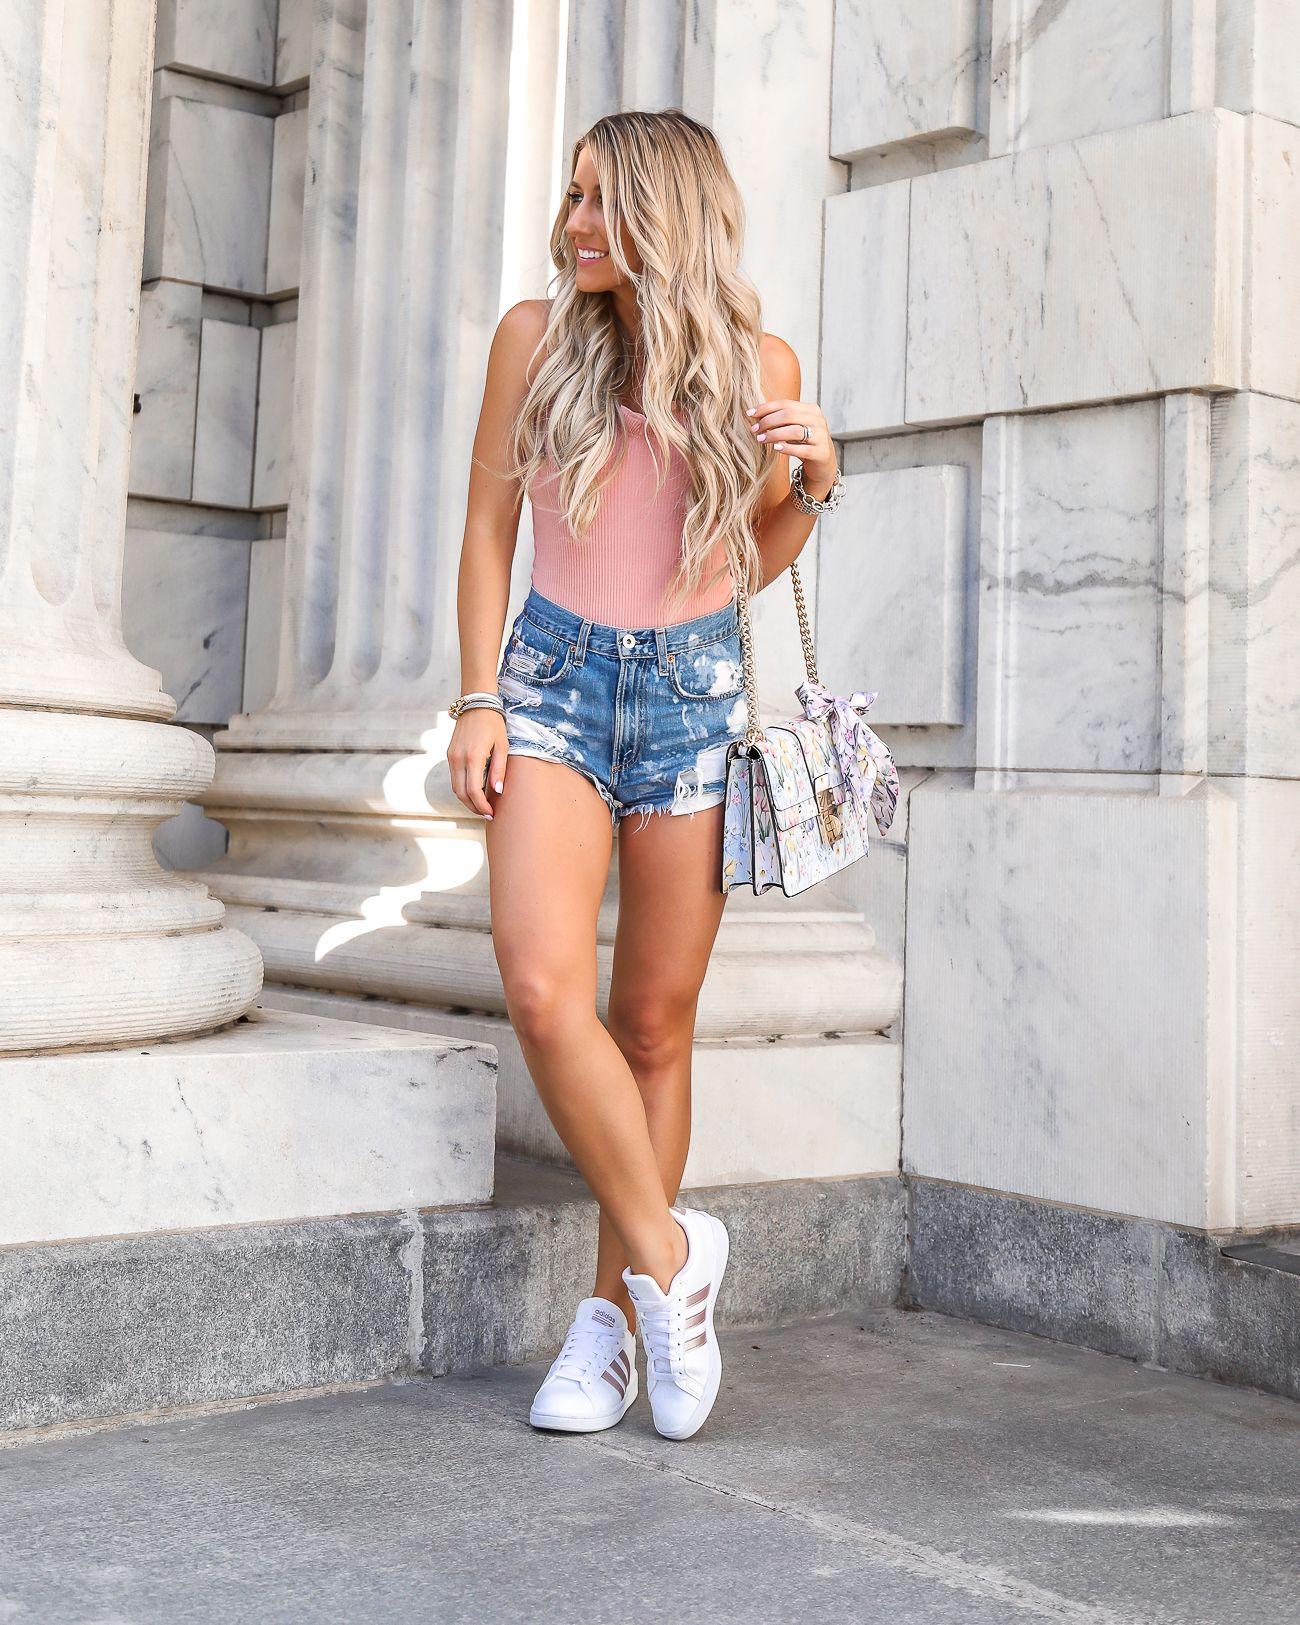 dd0602398f6 Casual Summer Outfit Rose Gold Adidas Cloudfoam Advantage Rag   Bone  Justine High-Rise Distressed Denim Shorts